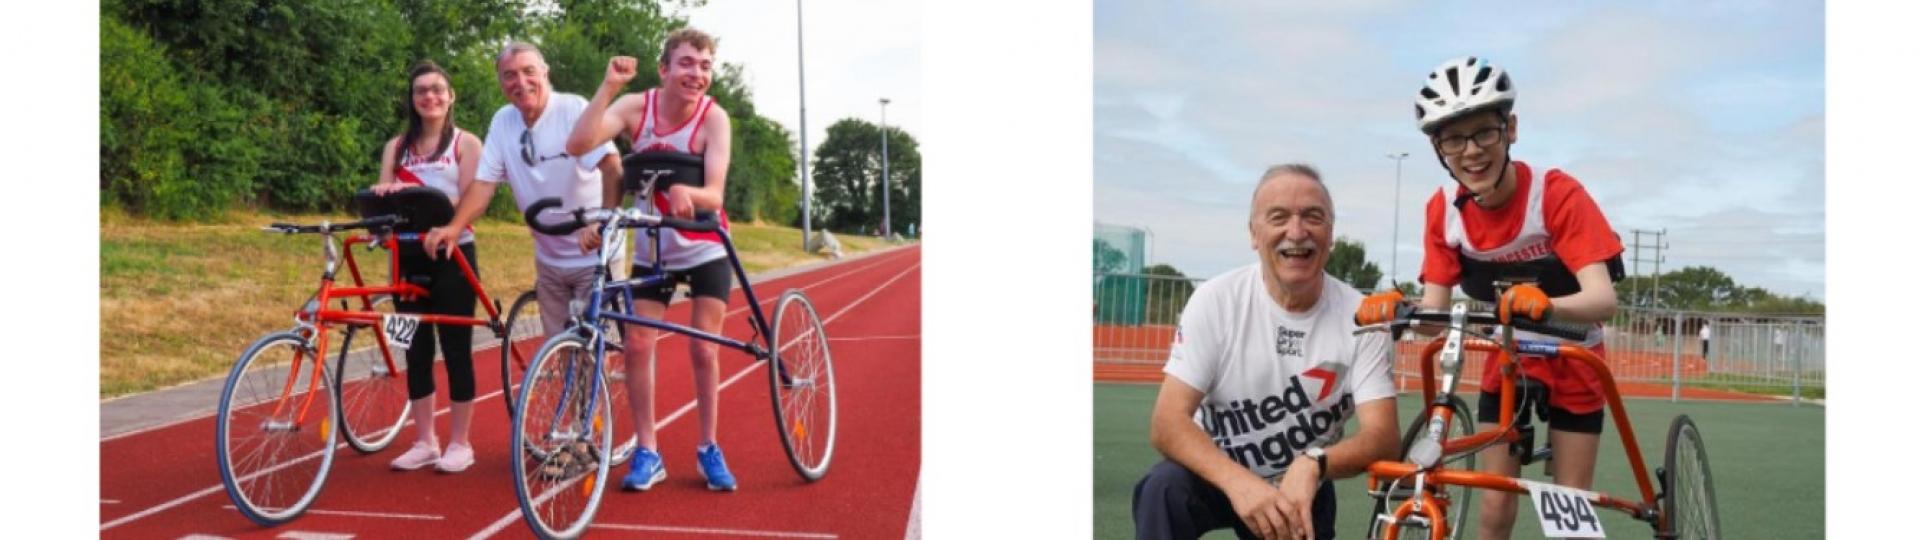 athletes on running track